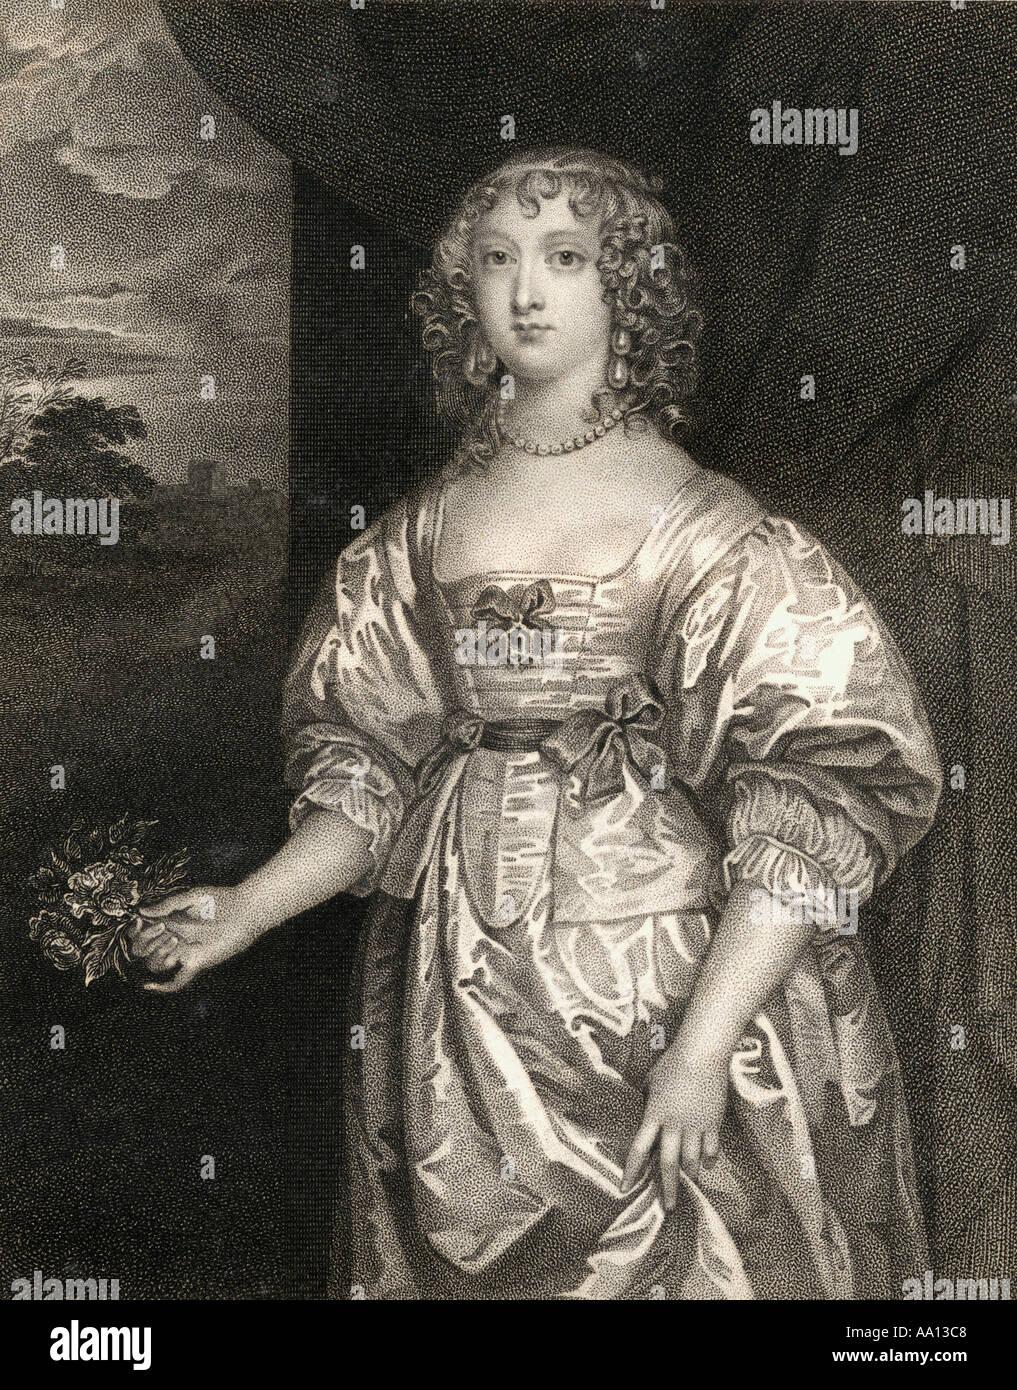 Felicity Devonshire